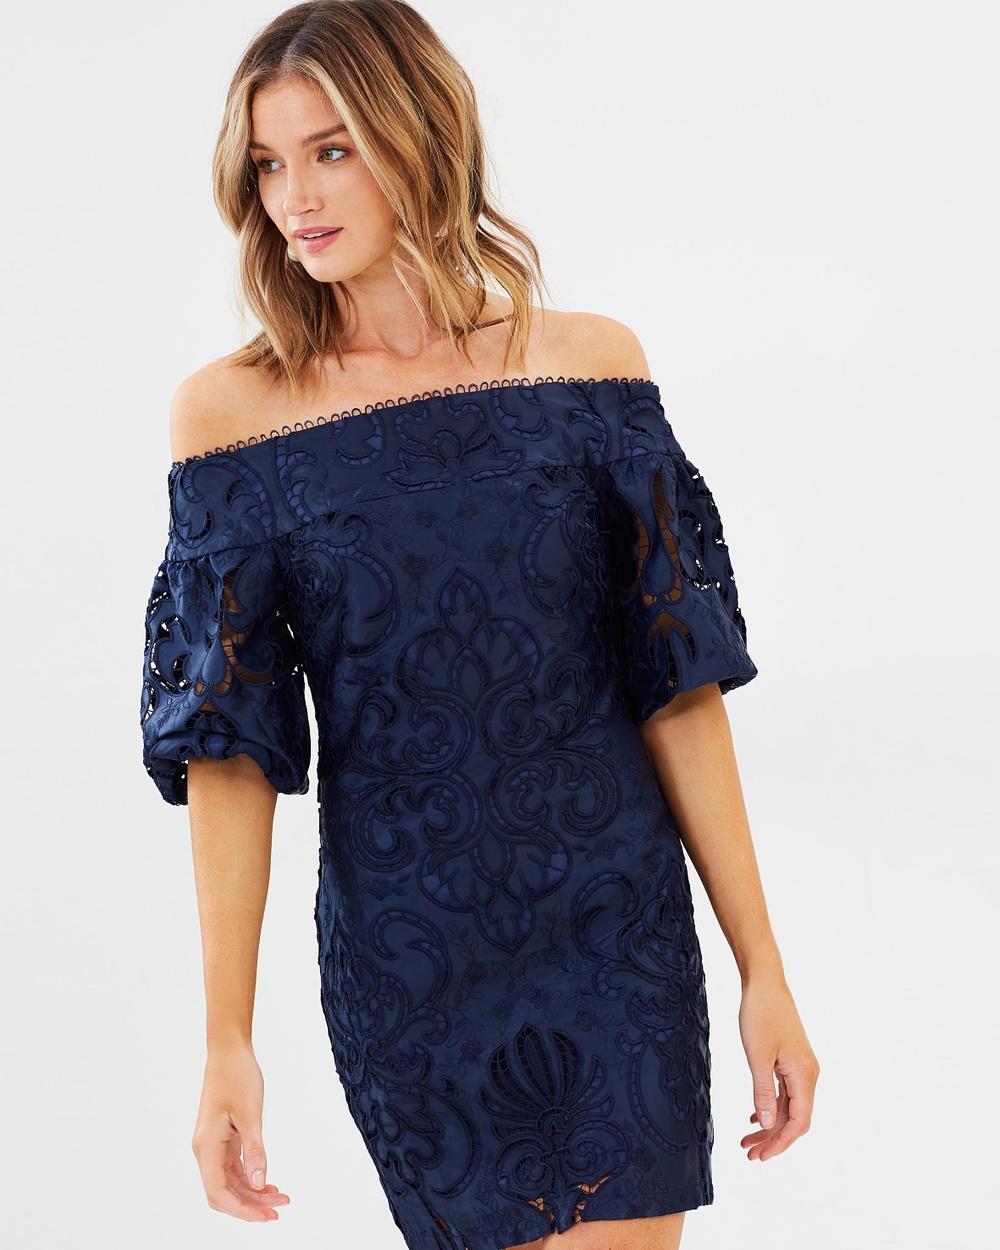 Ministry of Style Wild One Dress Dresses Nightfall Wild One Dress